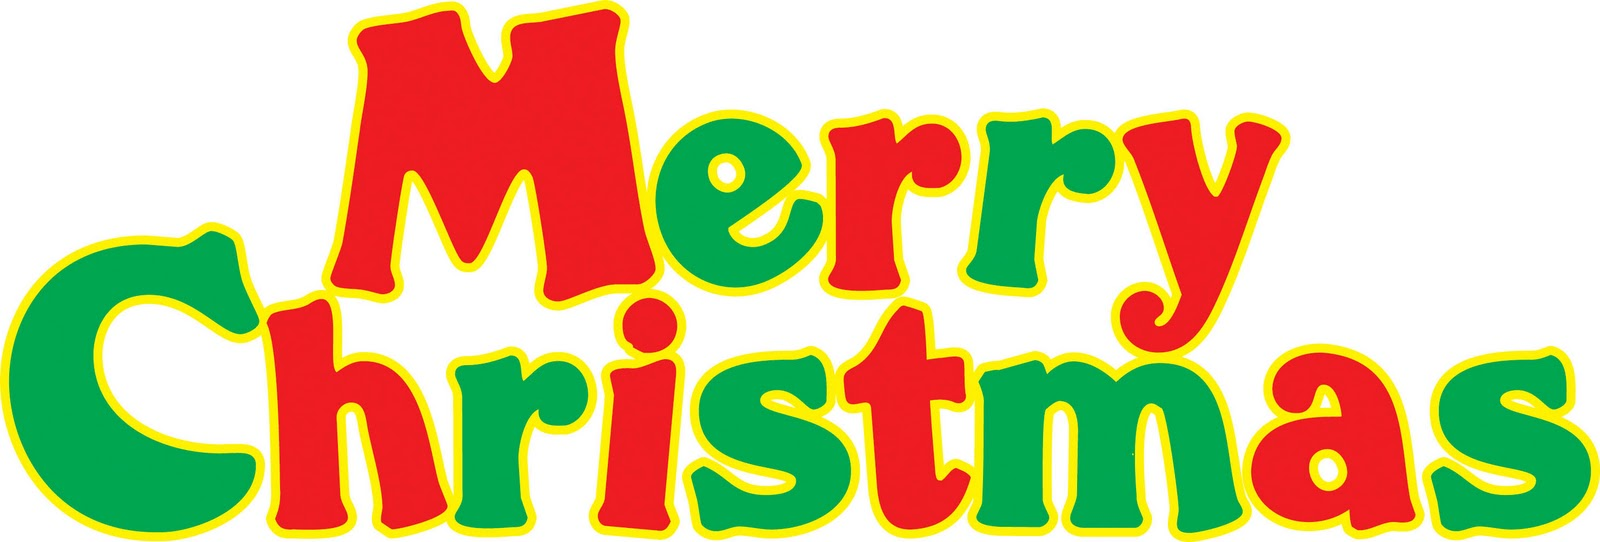 Merry Christmas Christian Clipart - Clipart Kid